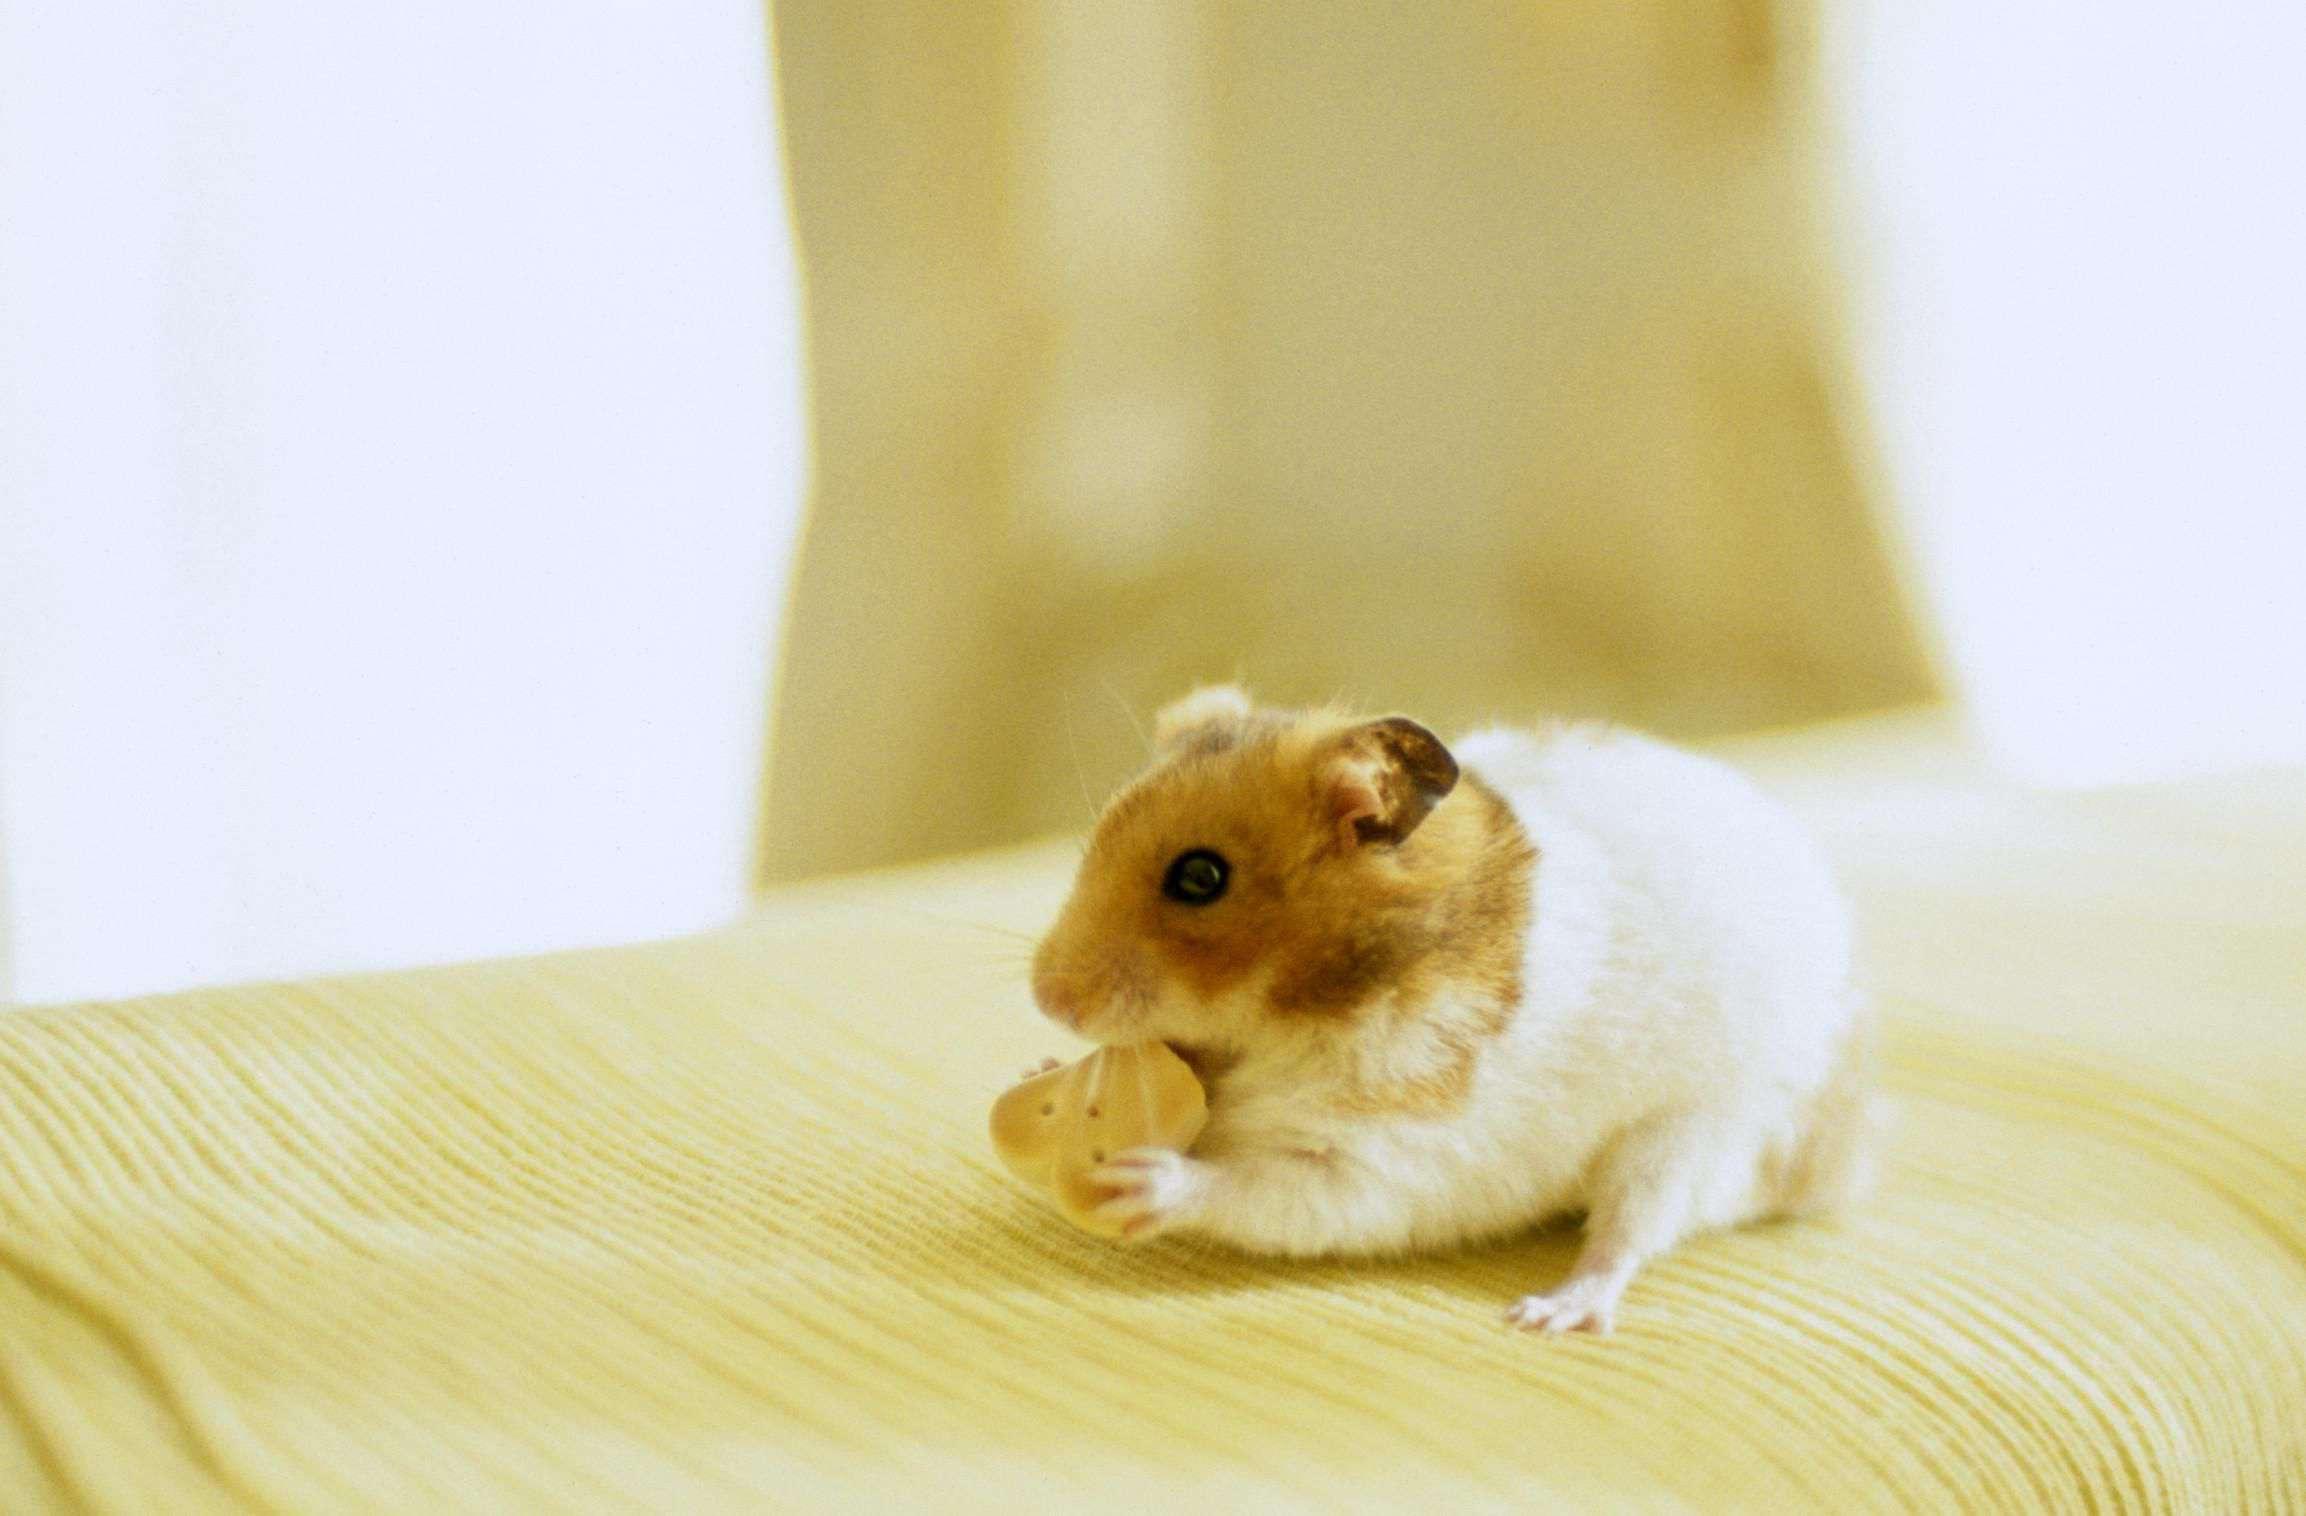 Hamster Diet & Nutrition